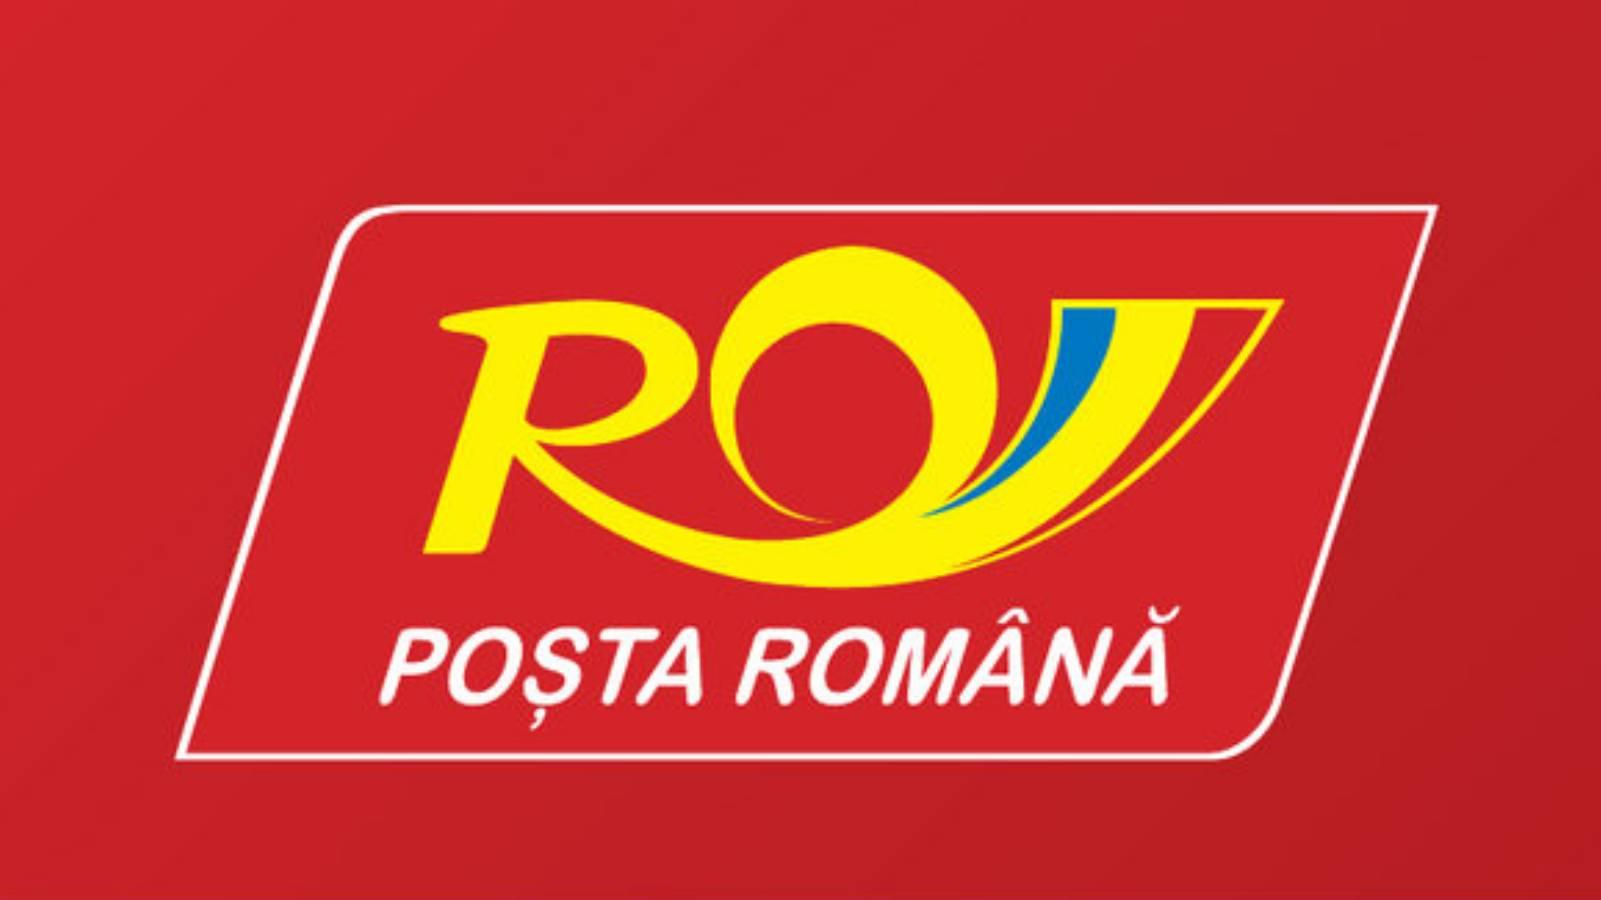 ATENTIONARE Posta Romana formular